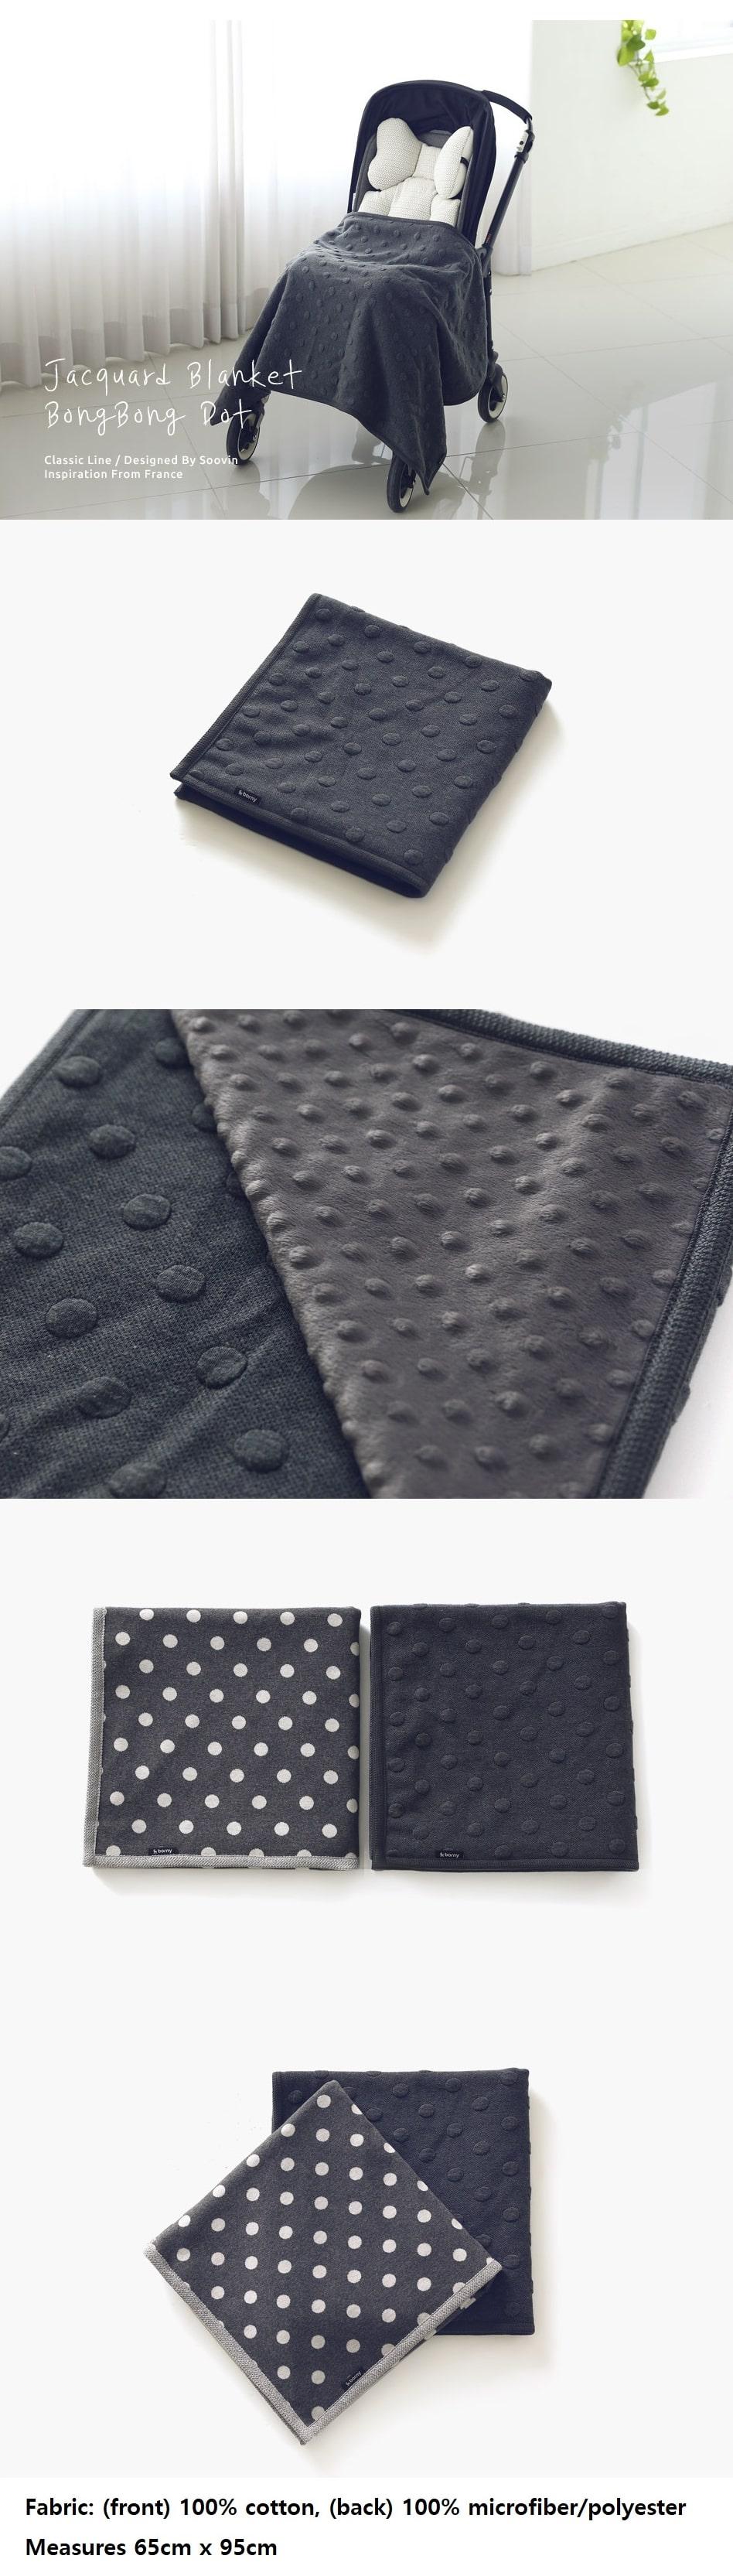 Large Blanket - Jacquard Black